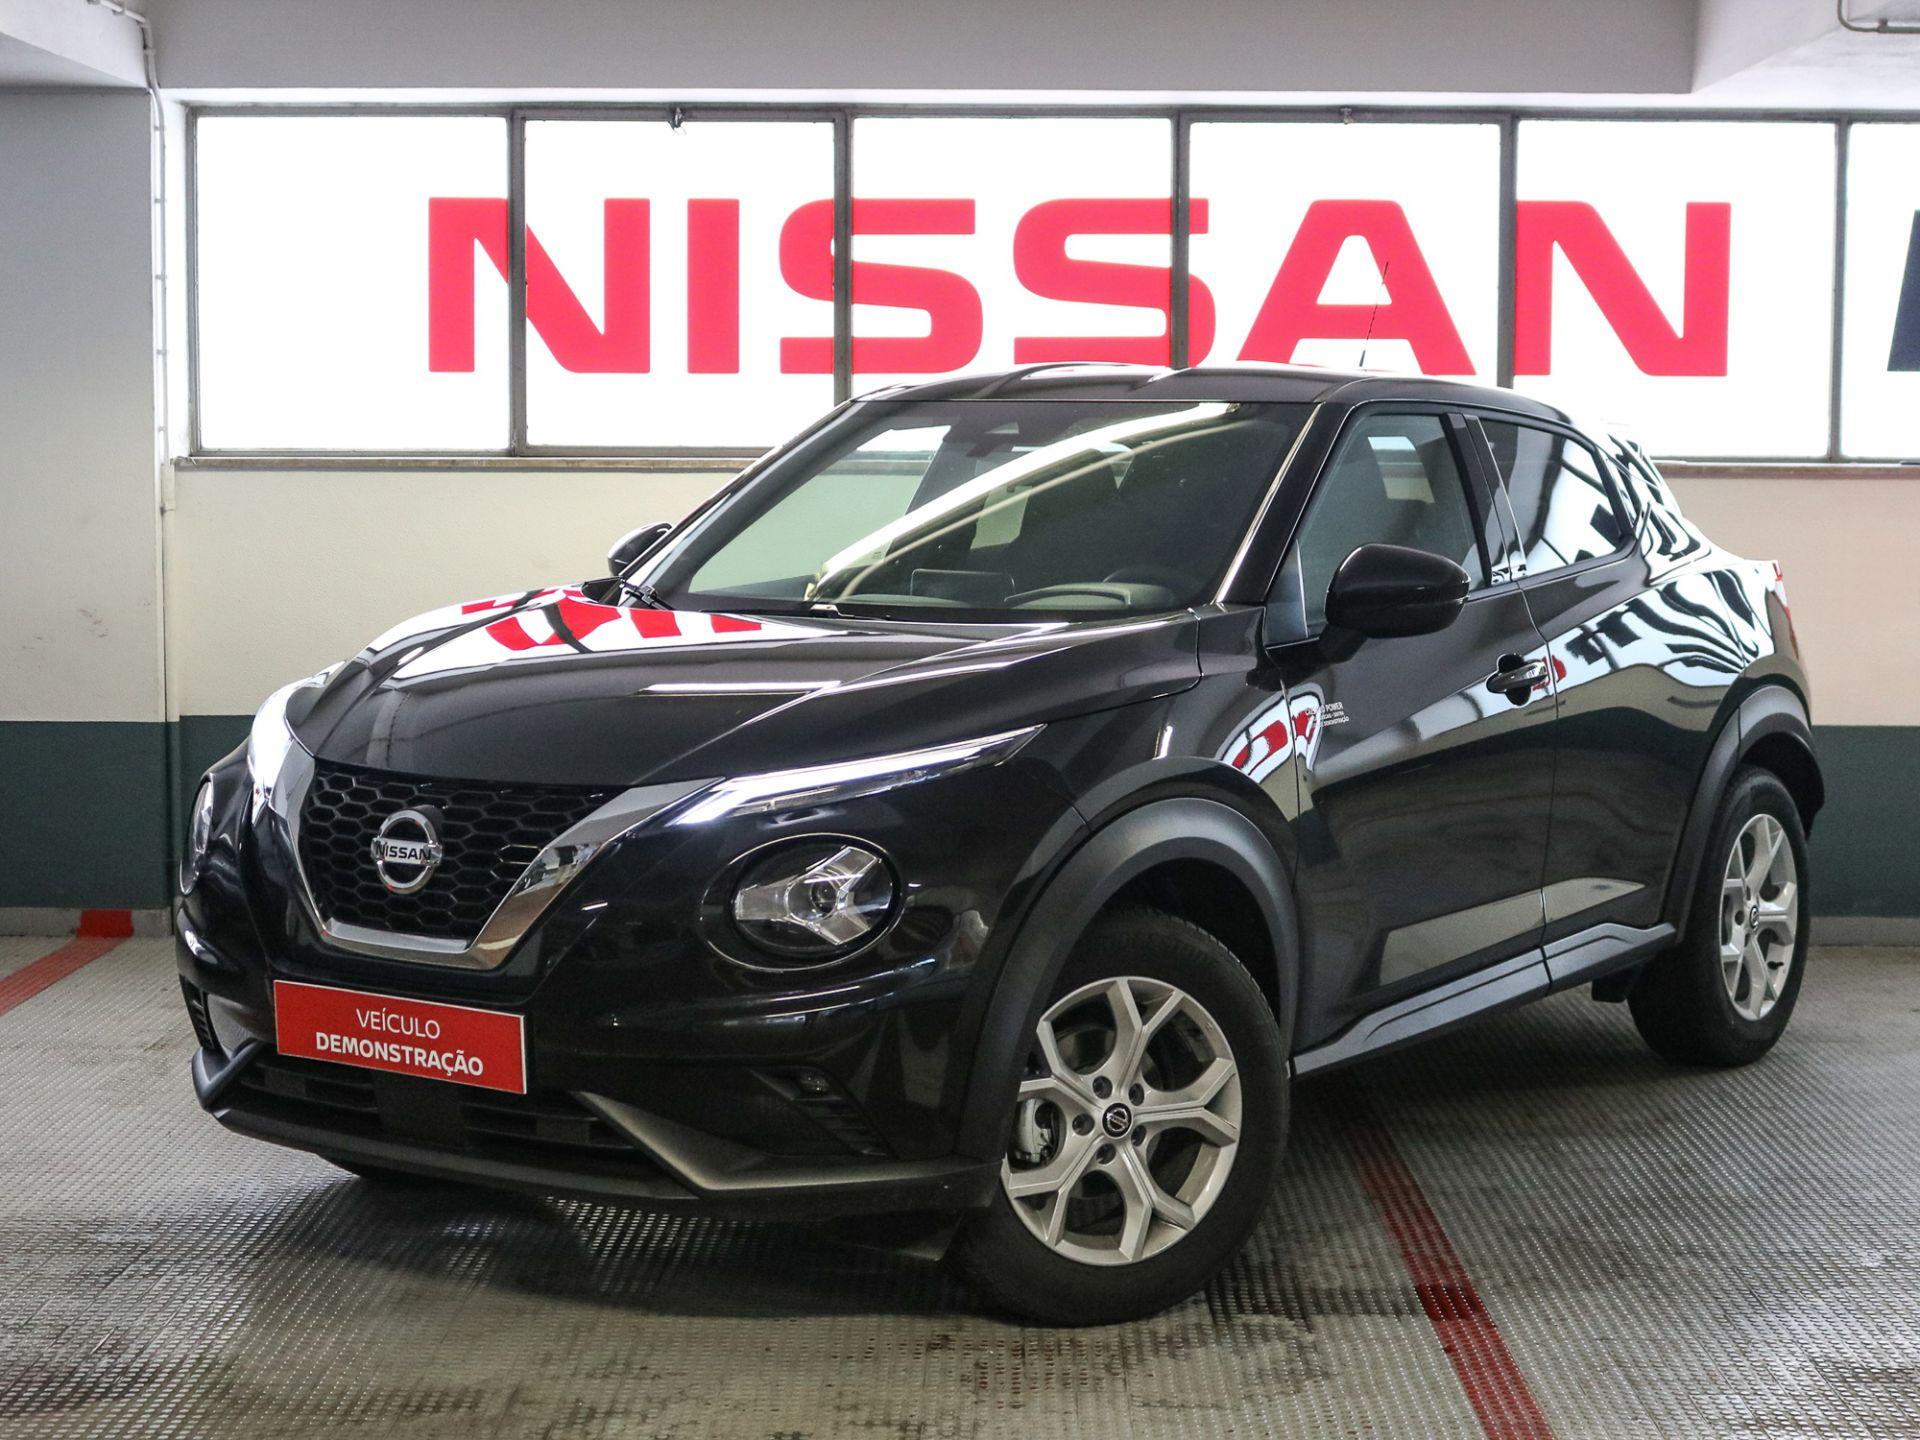 Nissan JUKE 1.0 DIG-T 117CV 6 M/T ACENTA segunda mão Lisboa